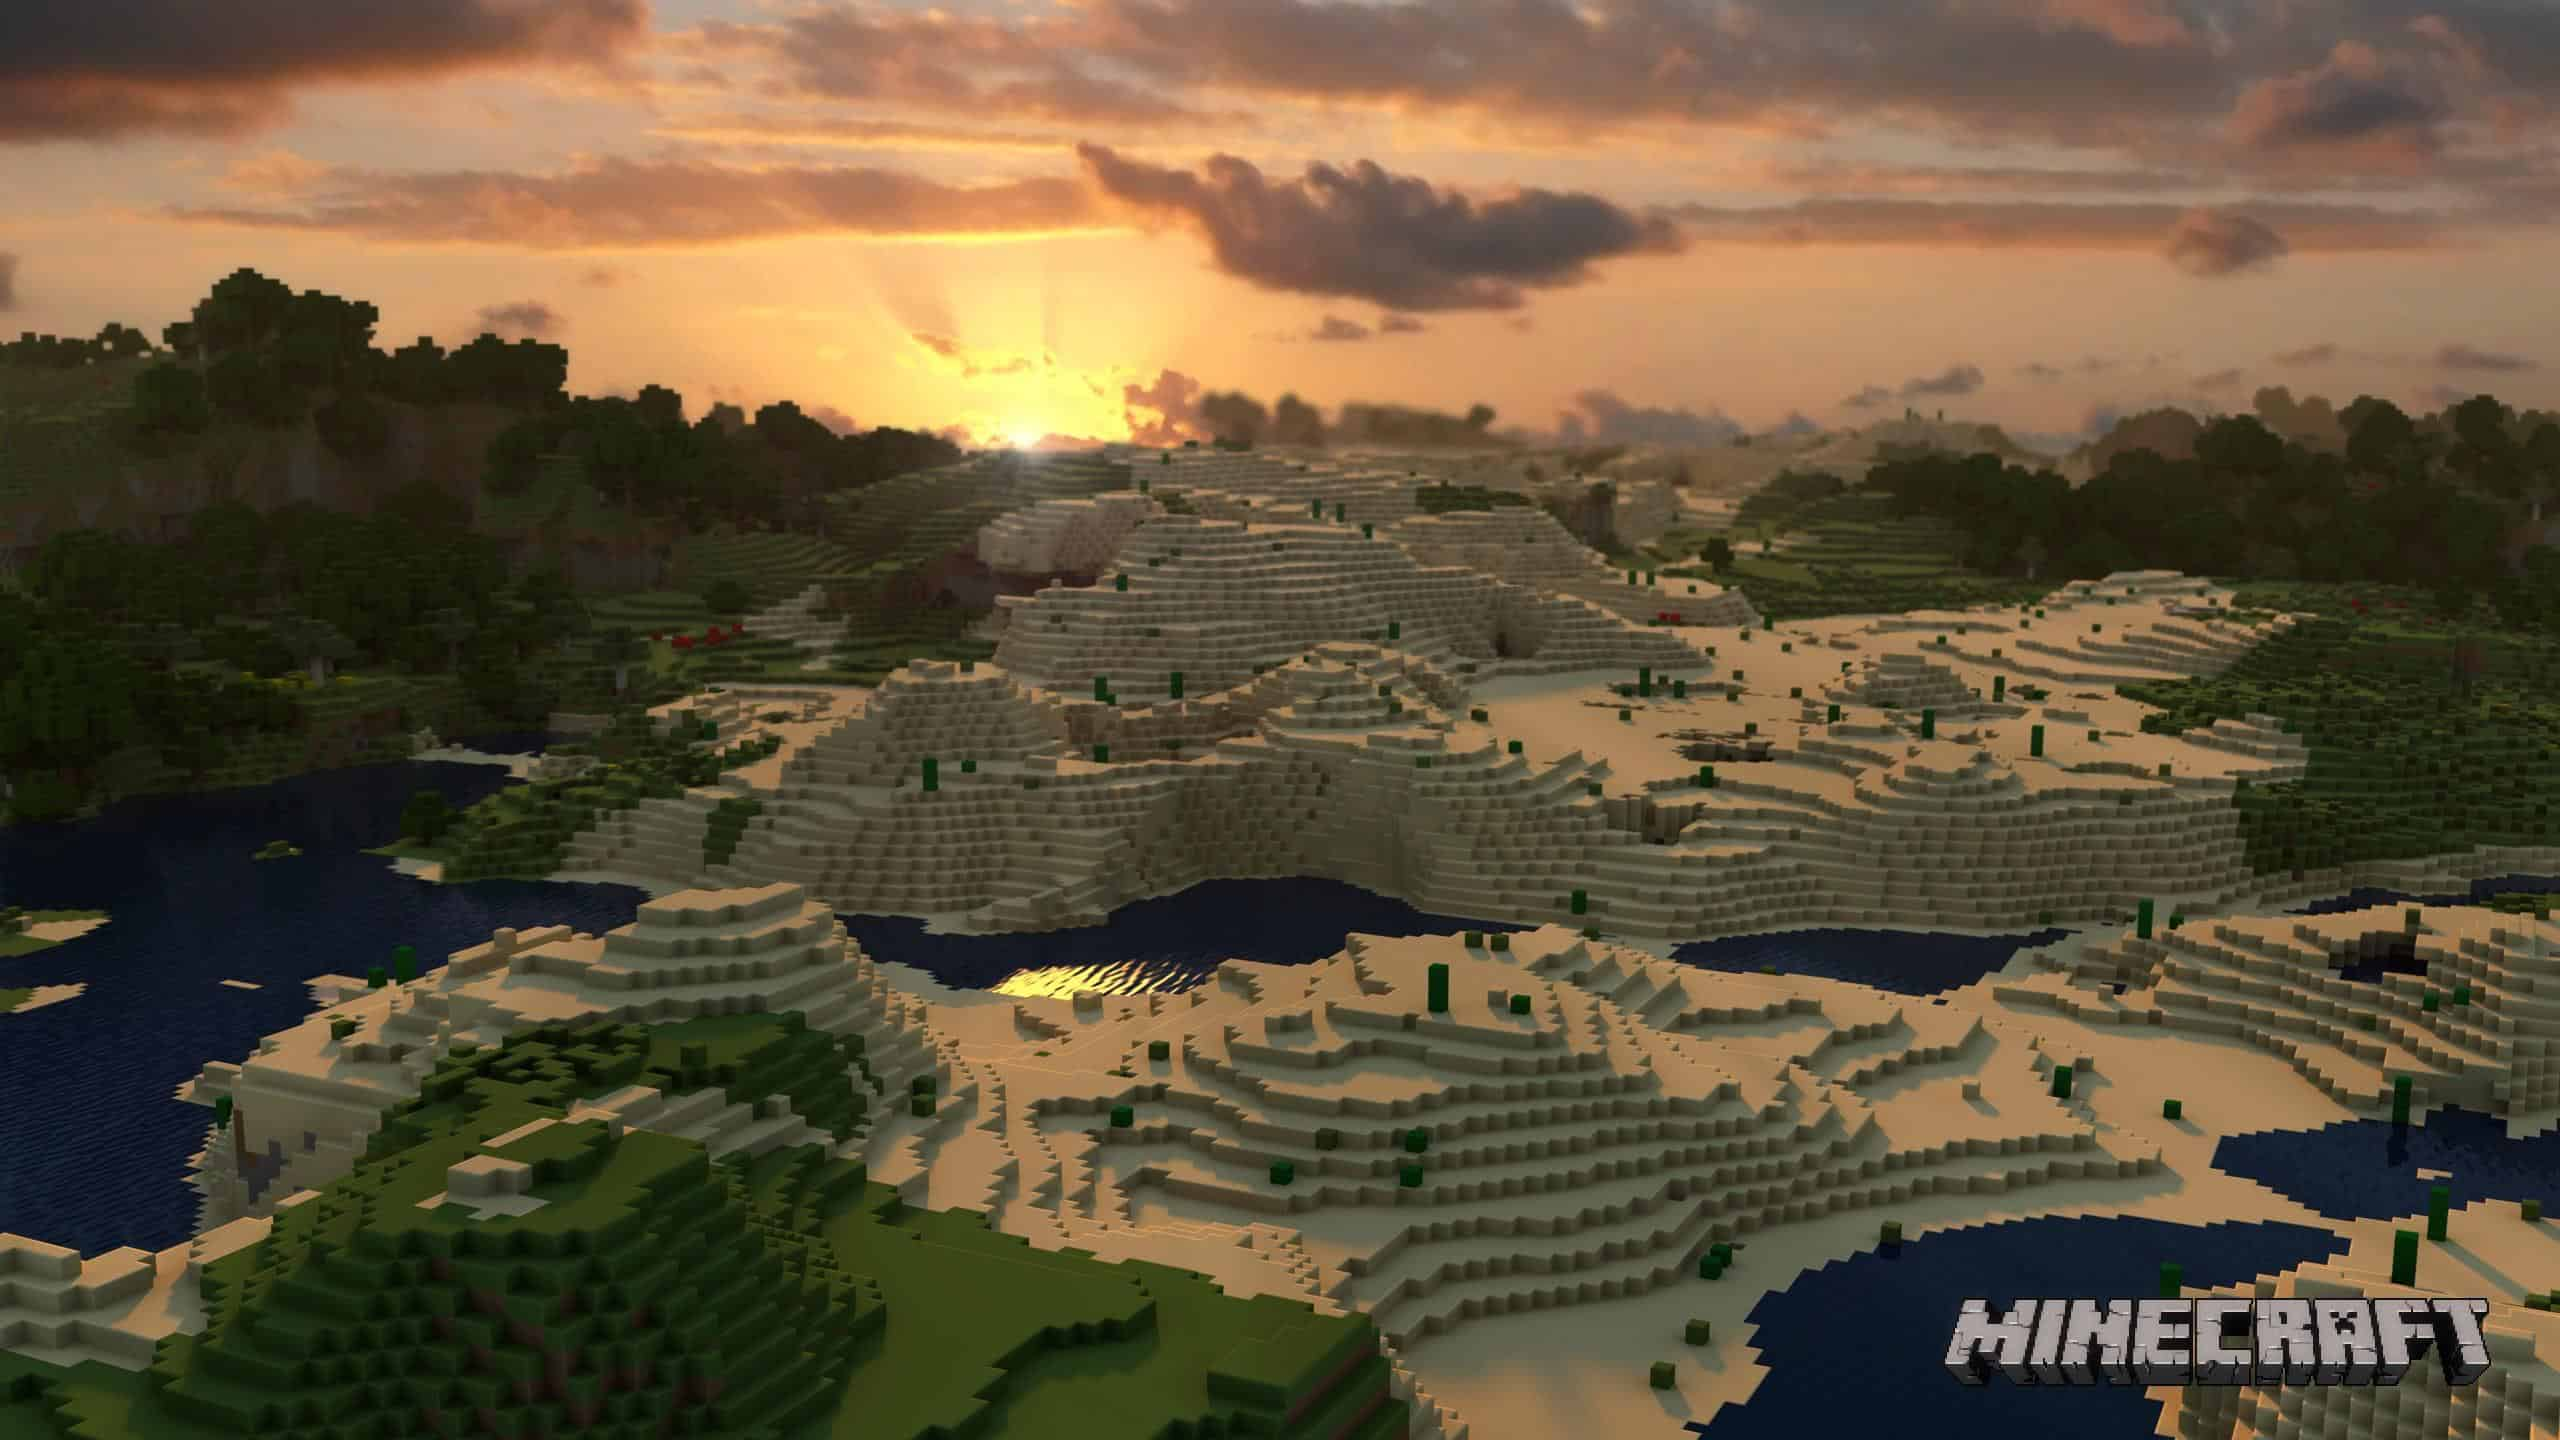 minecraft landscape wqhd 1440p wallpaper